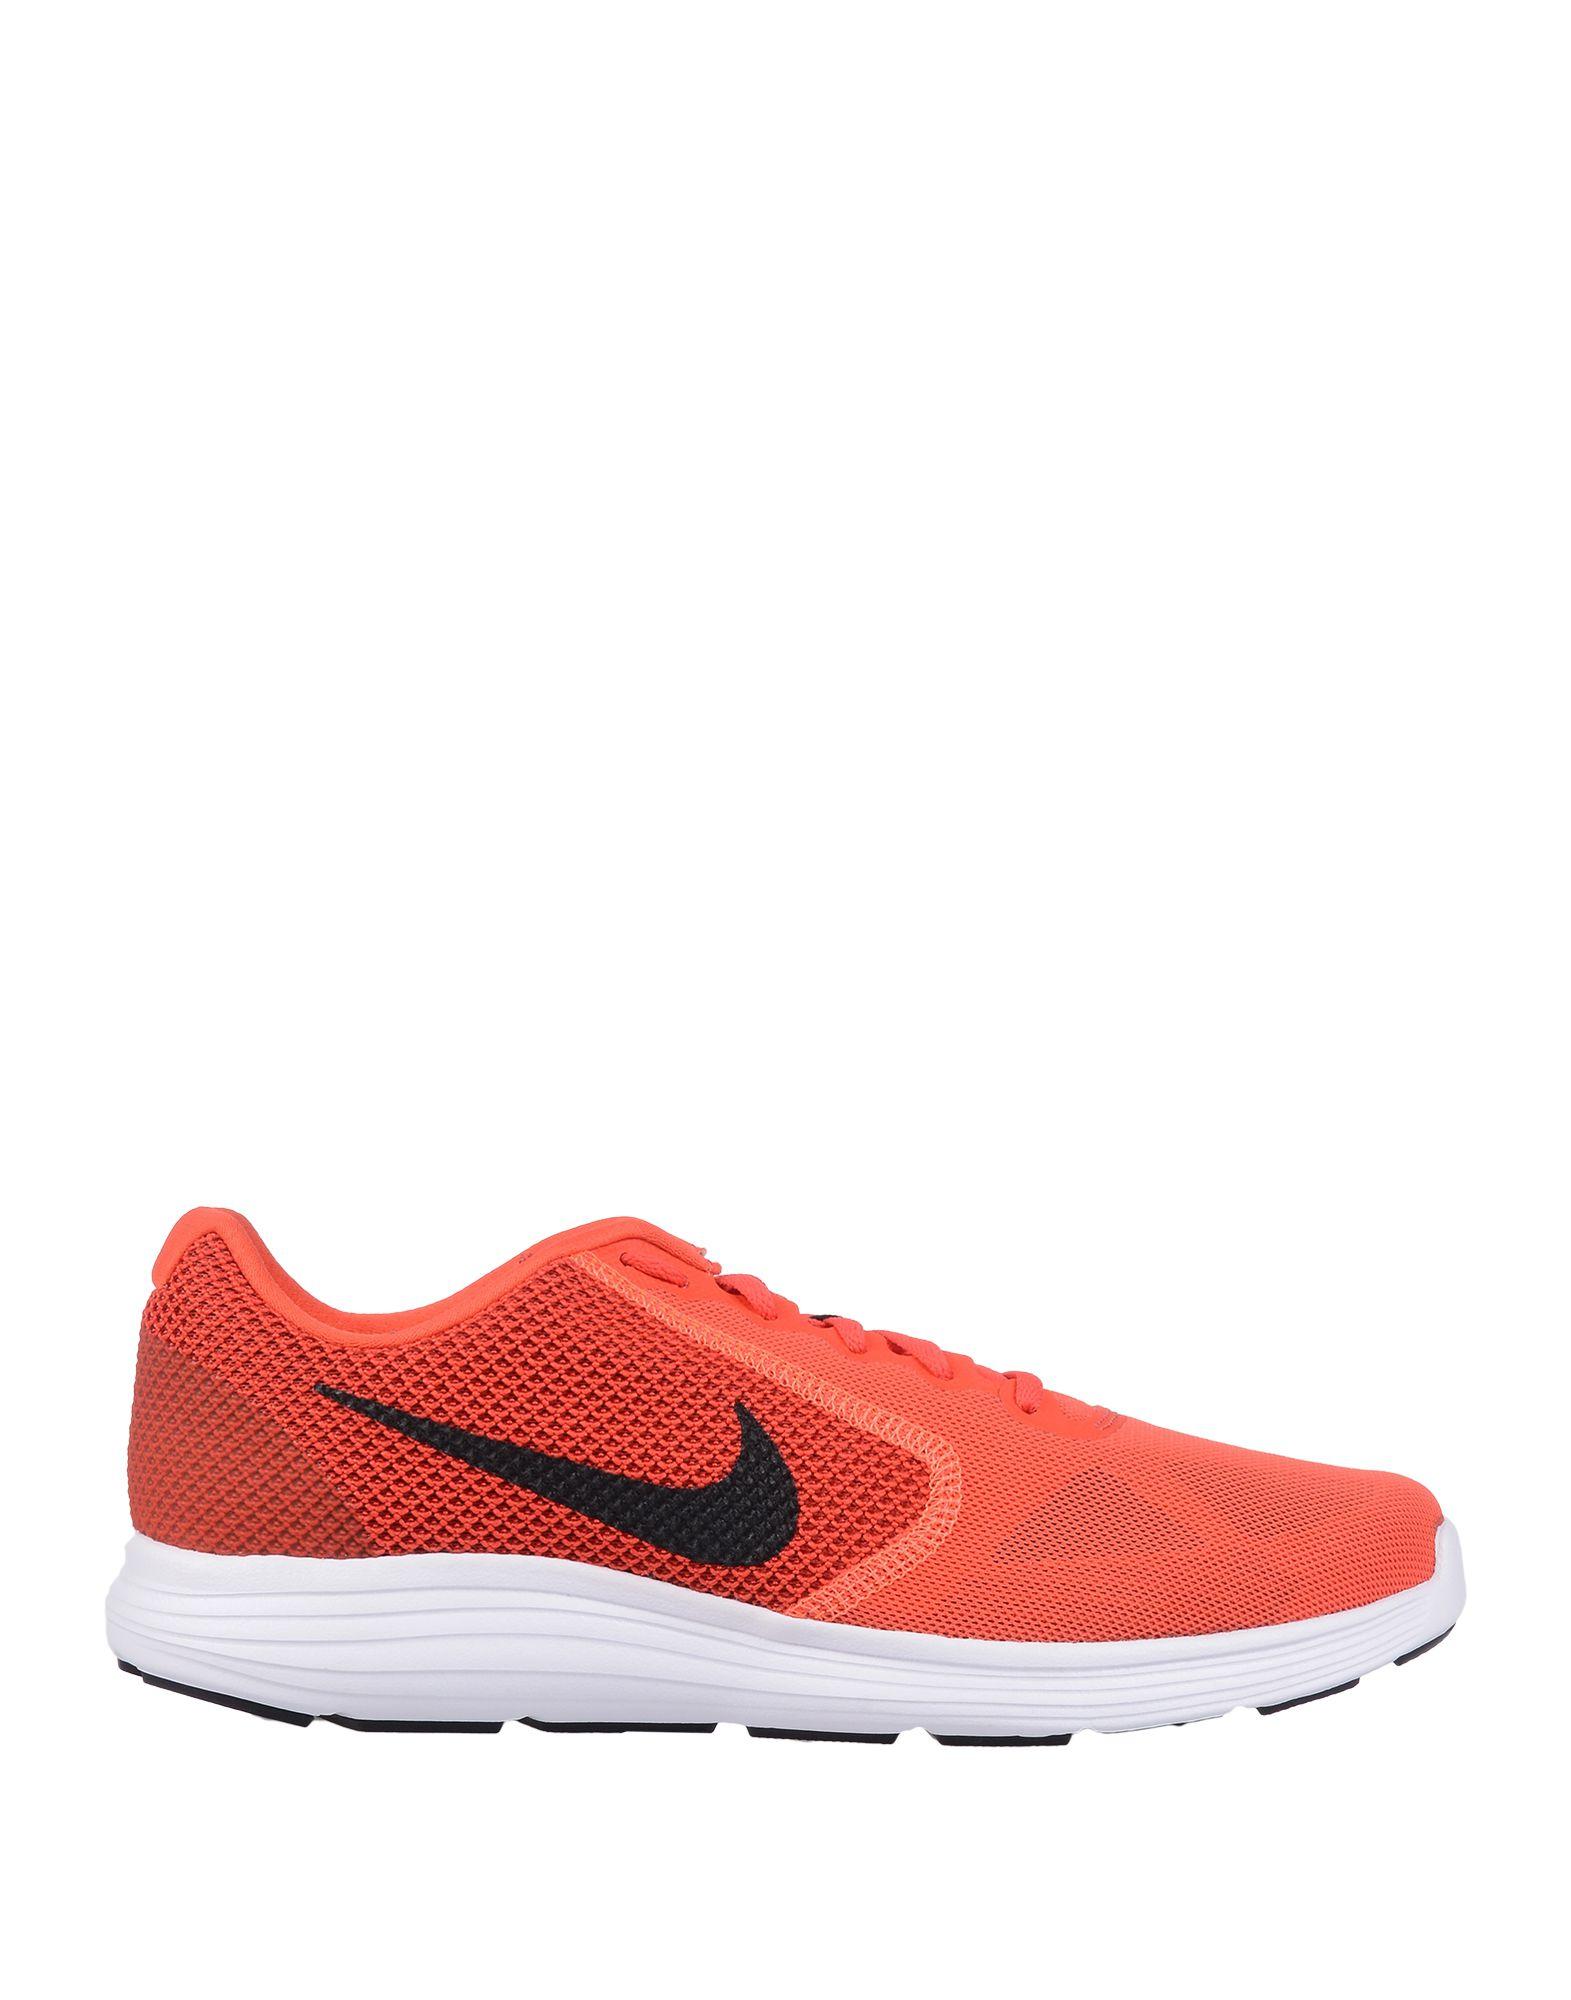 Nike Sneakers - on Men Nike Sneakers online on -  Australia - 11403336UA 718bf8